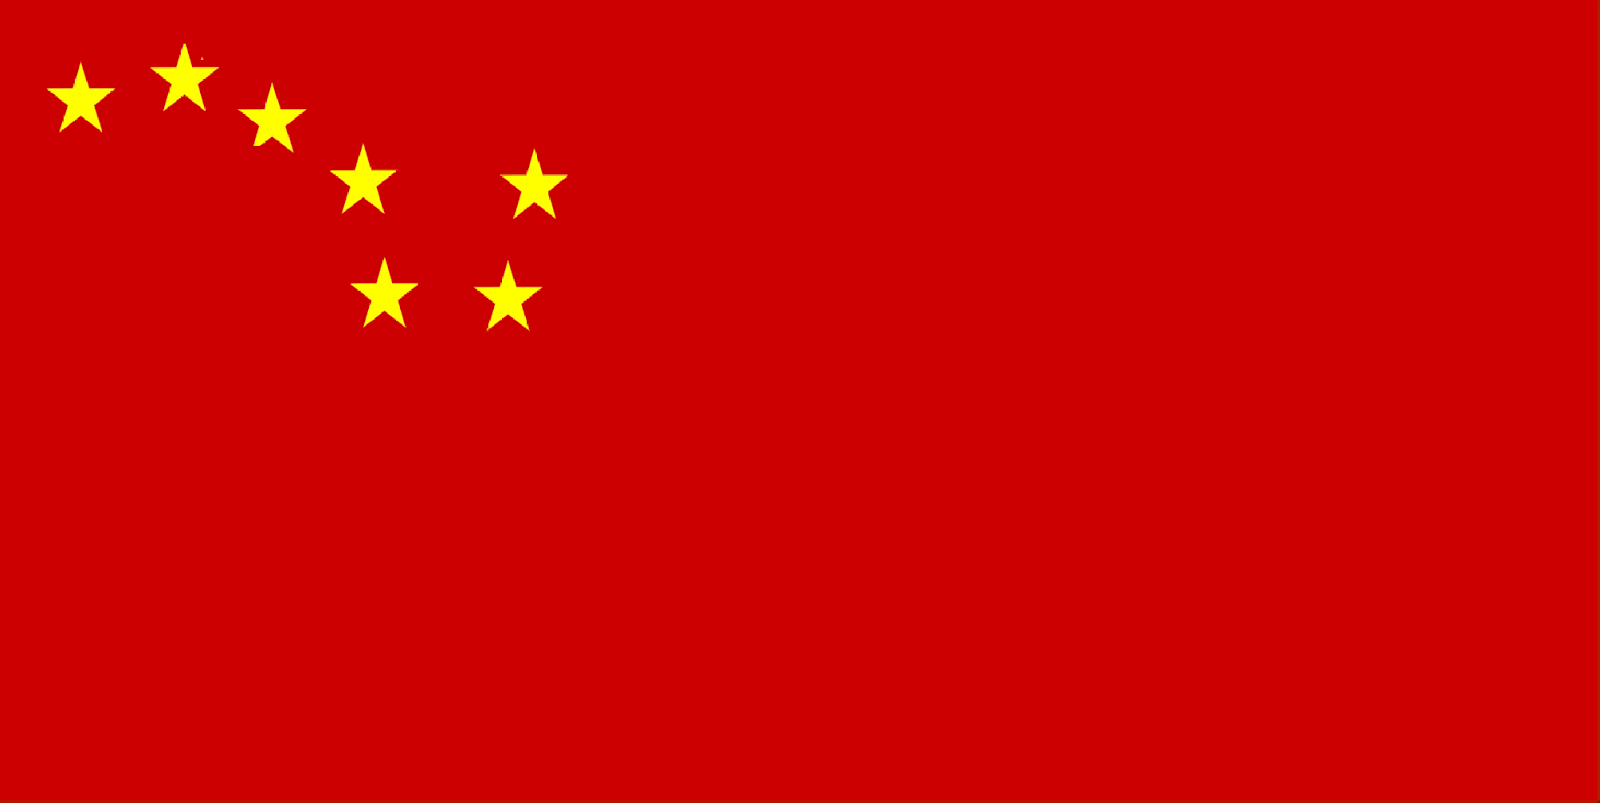 sam u0027s flags communist british isles alternative history